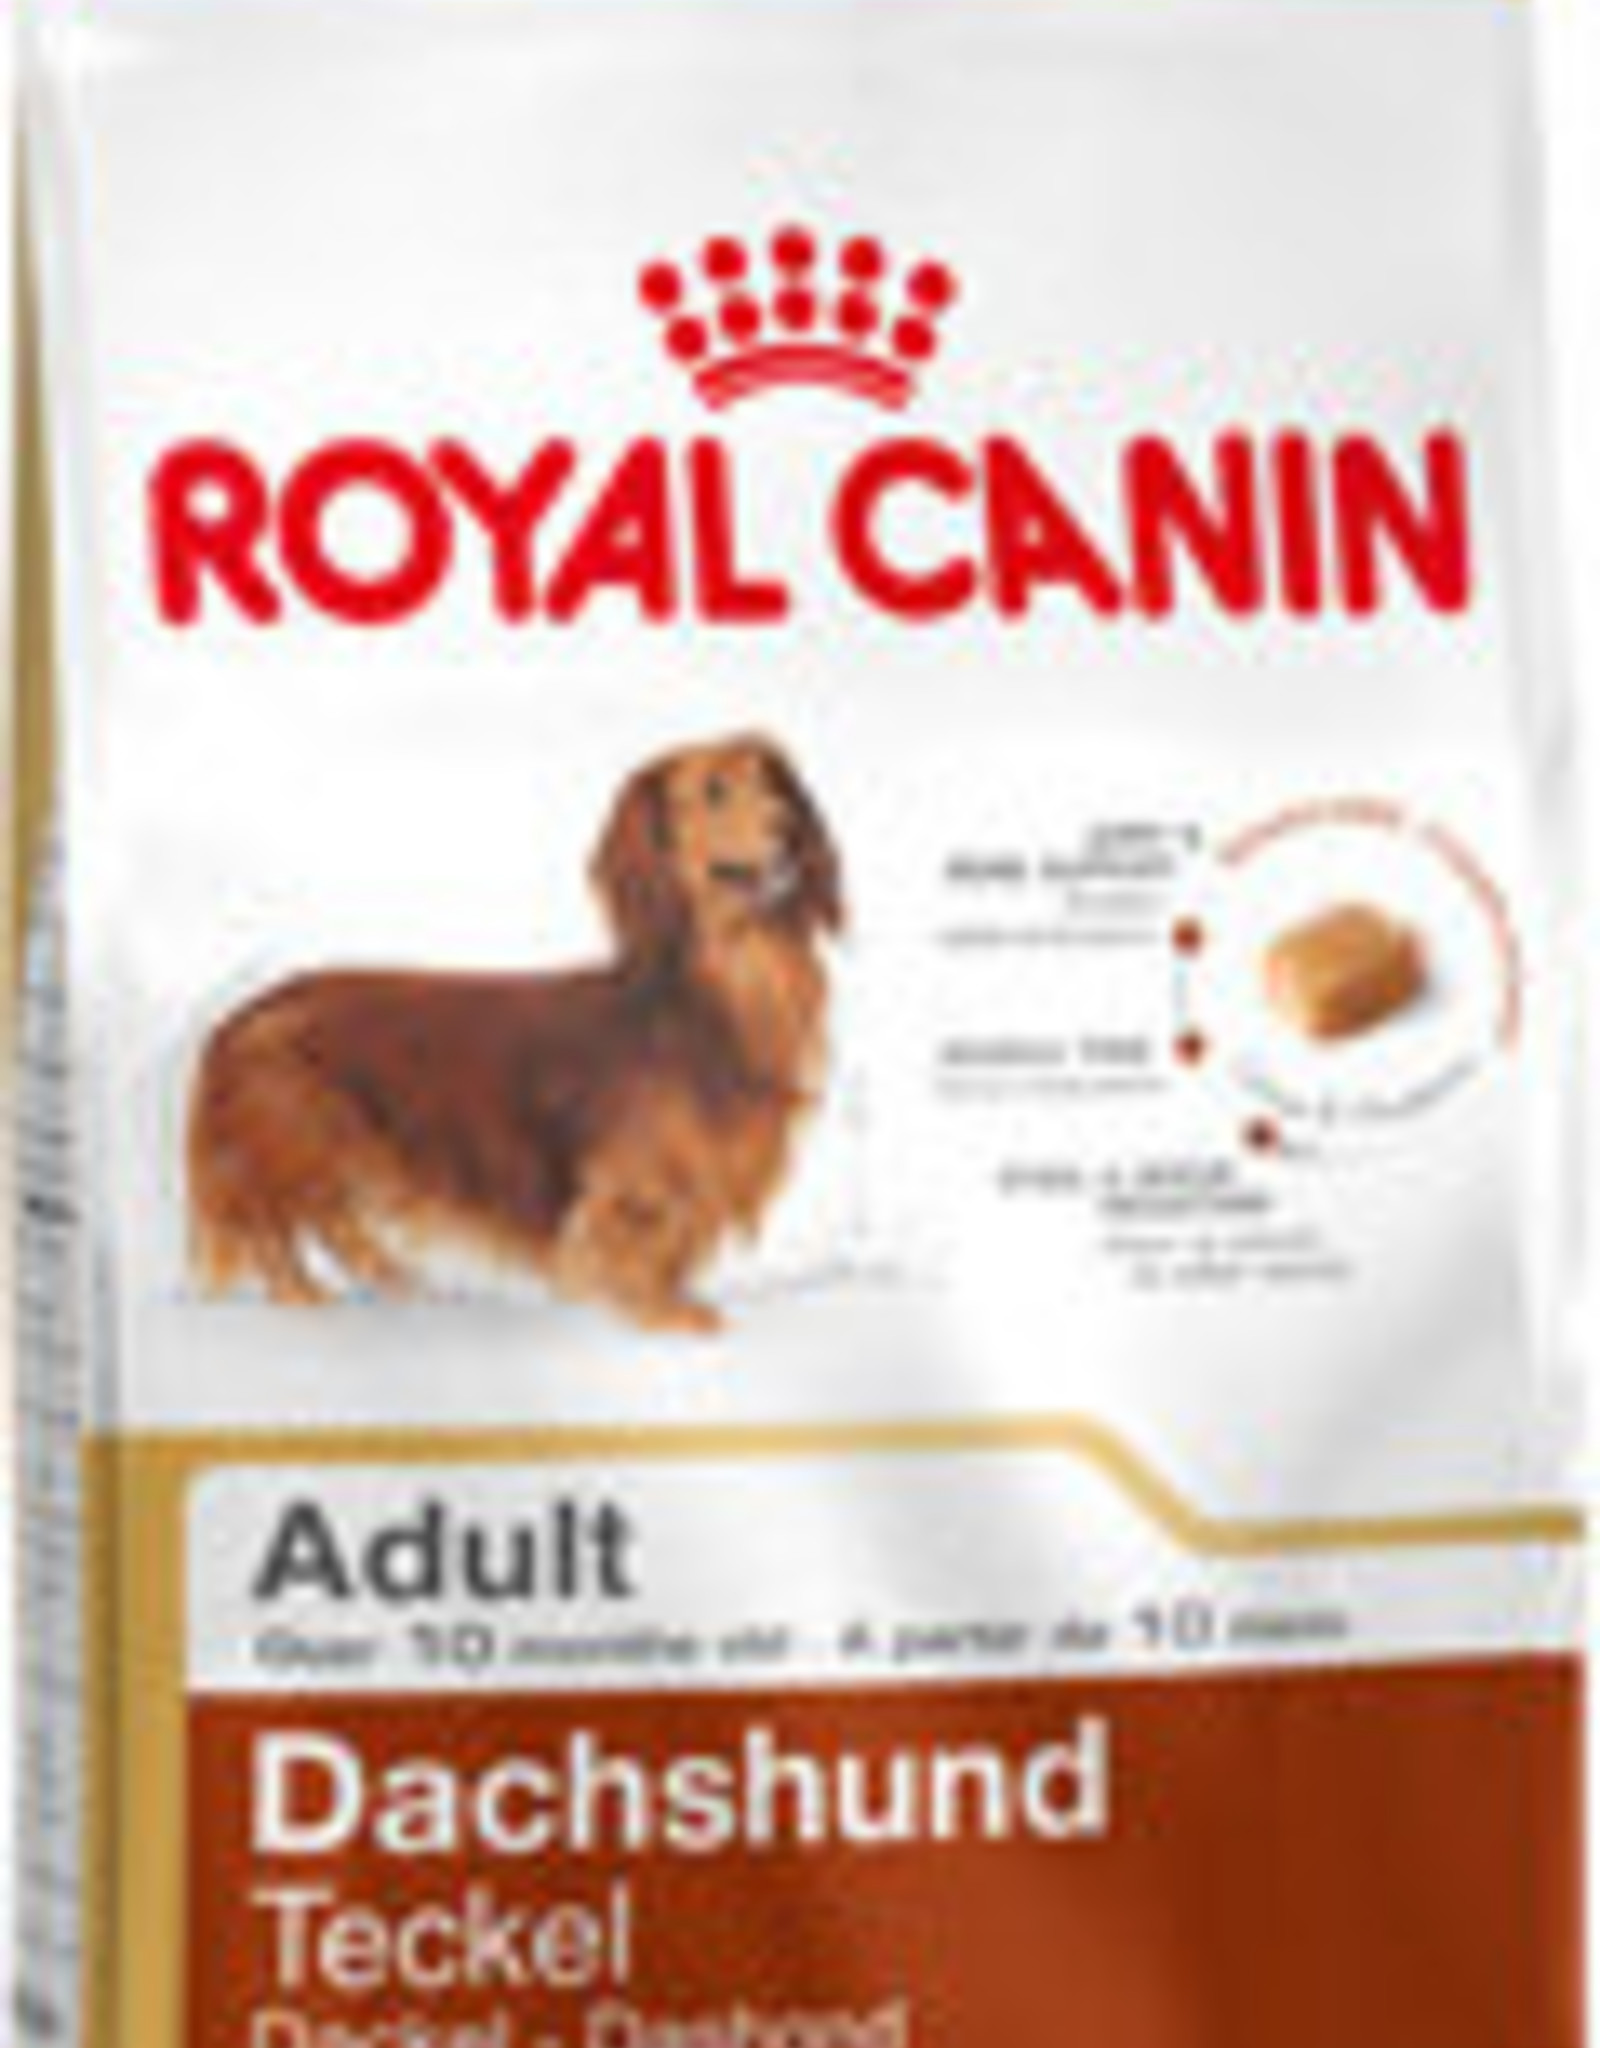 Royal Canin Royal Canin Bhn Dachshund 7.5kg